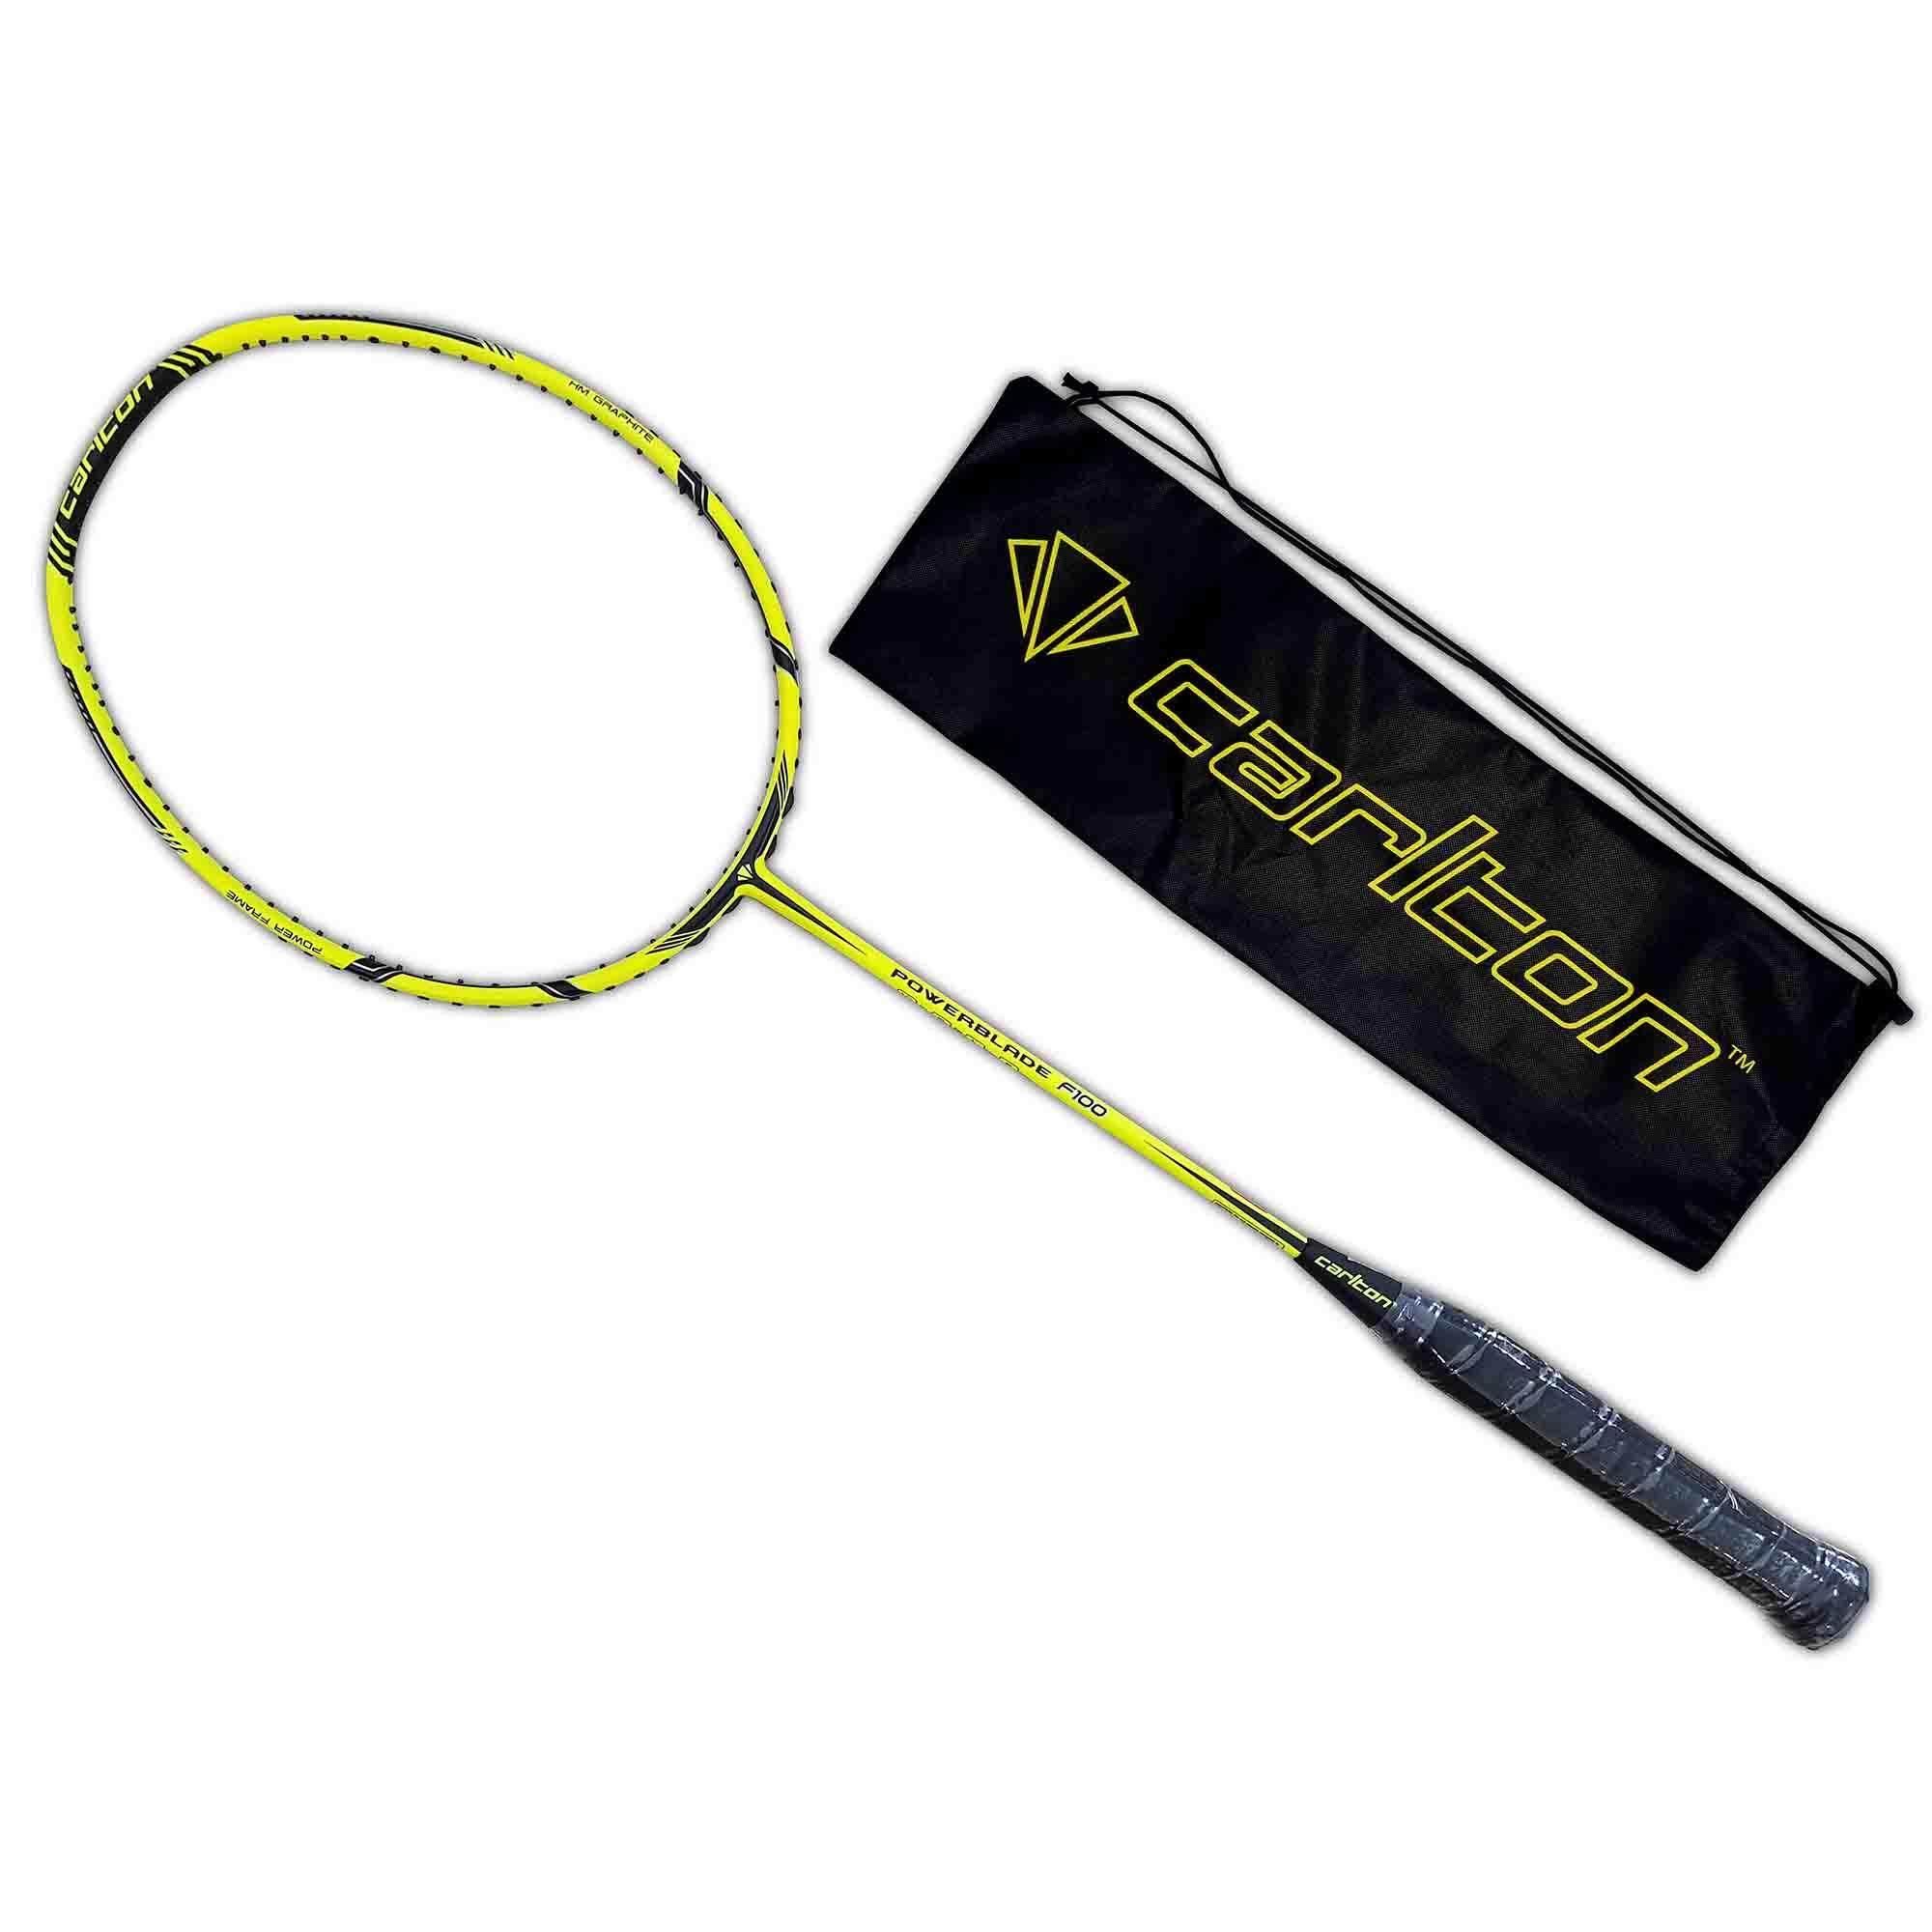 Carlton Badminton Racket Powerblade F 100